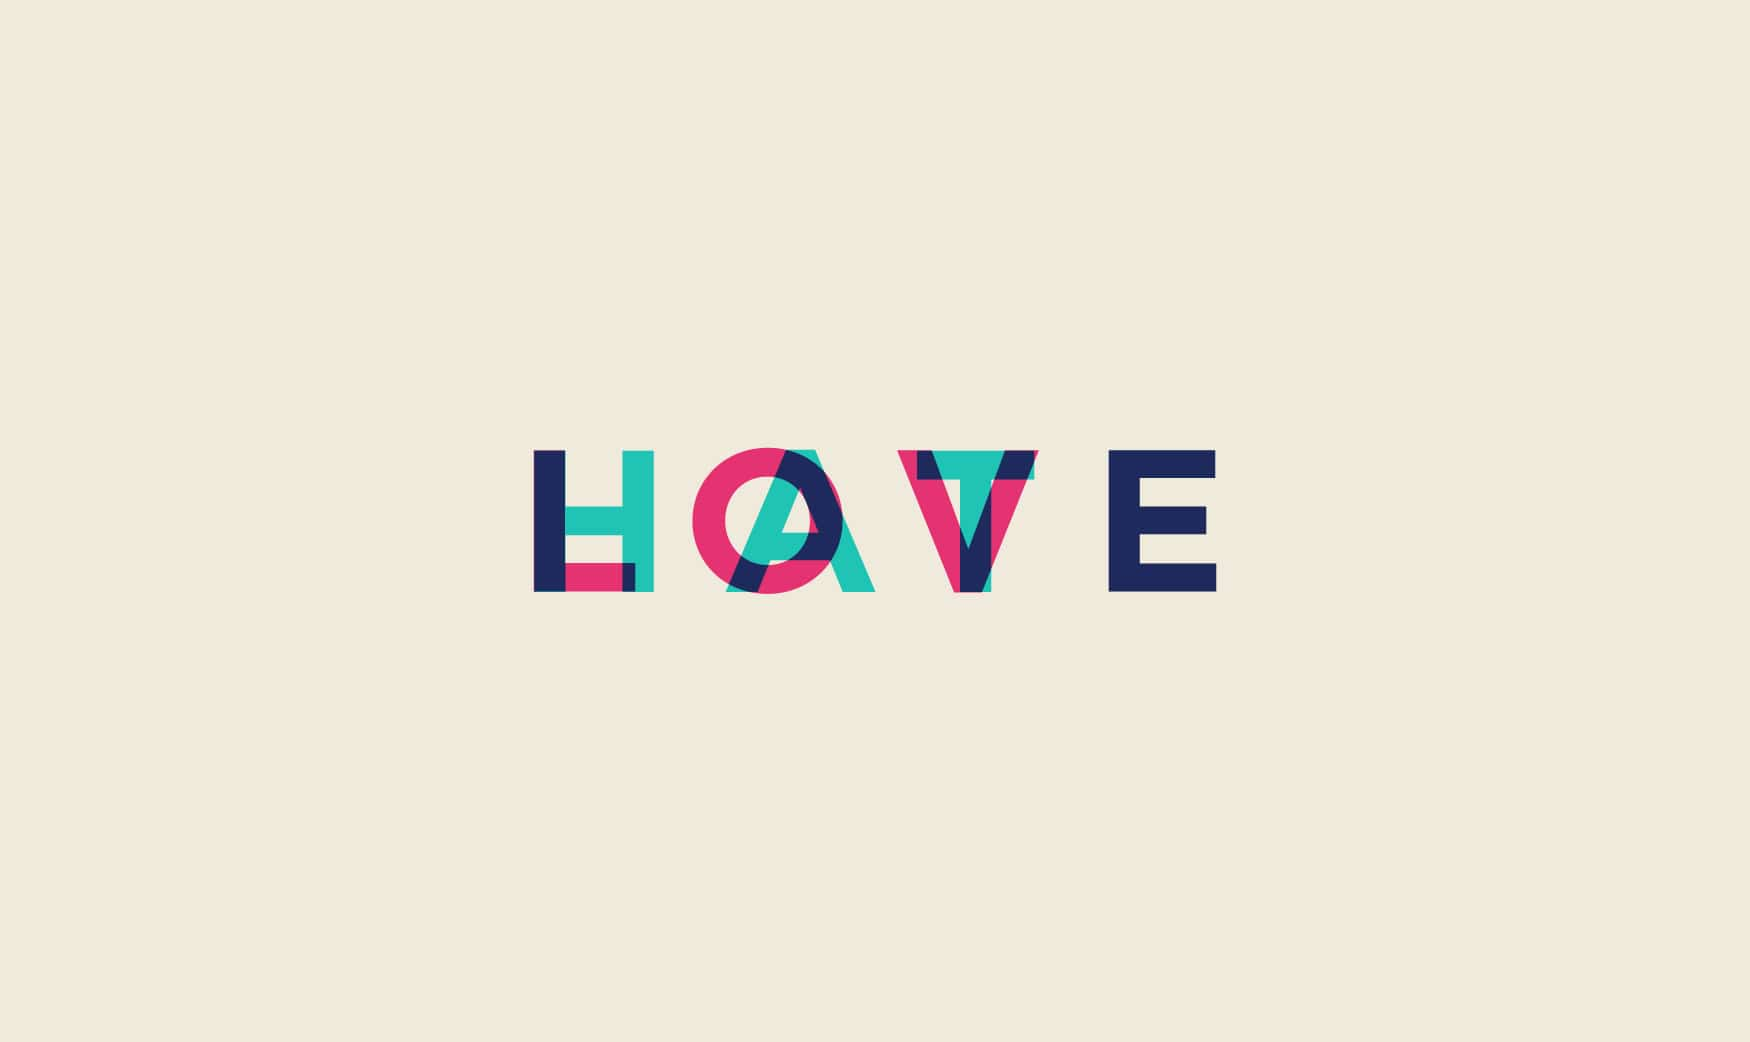 Branding: Love hate